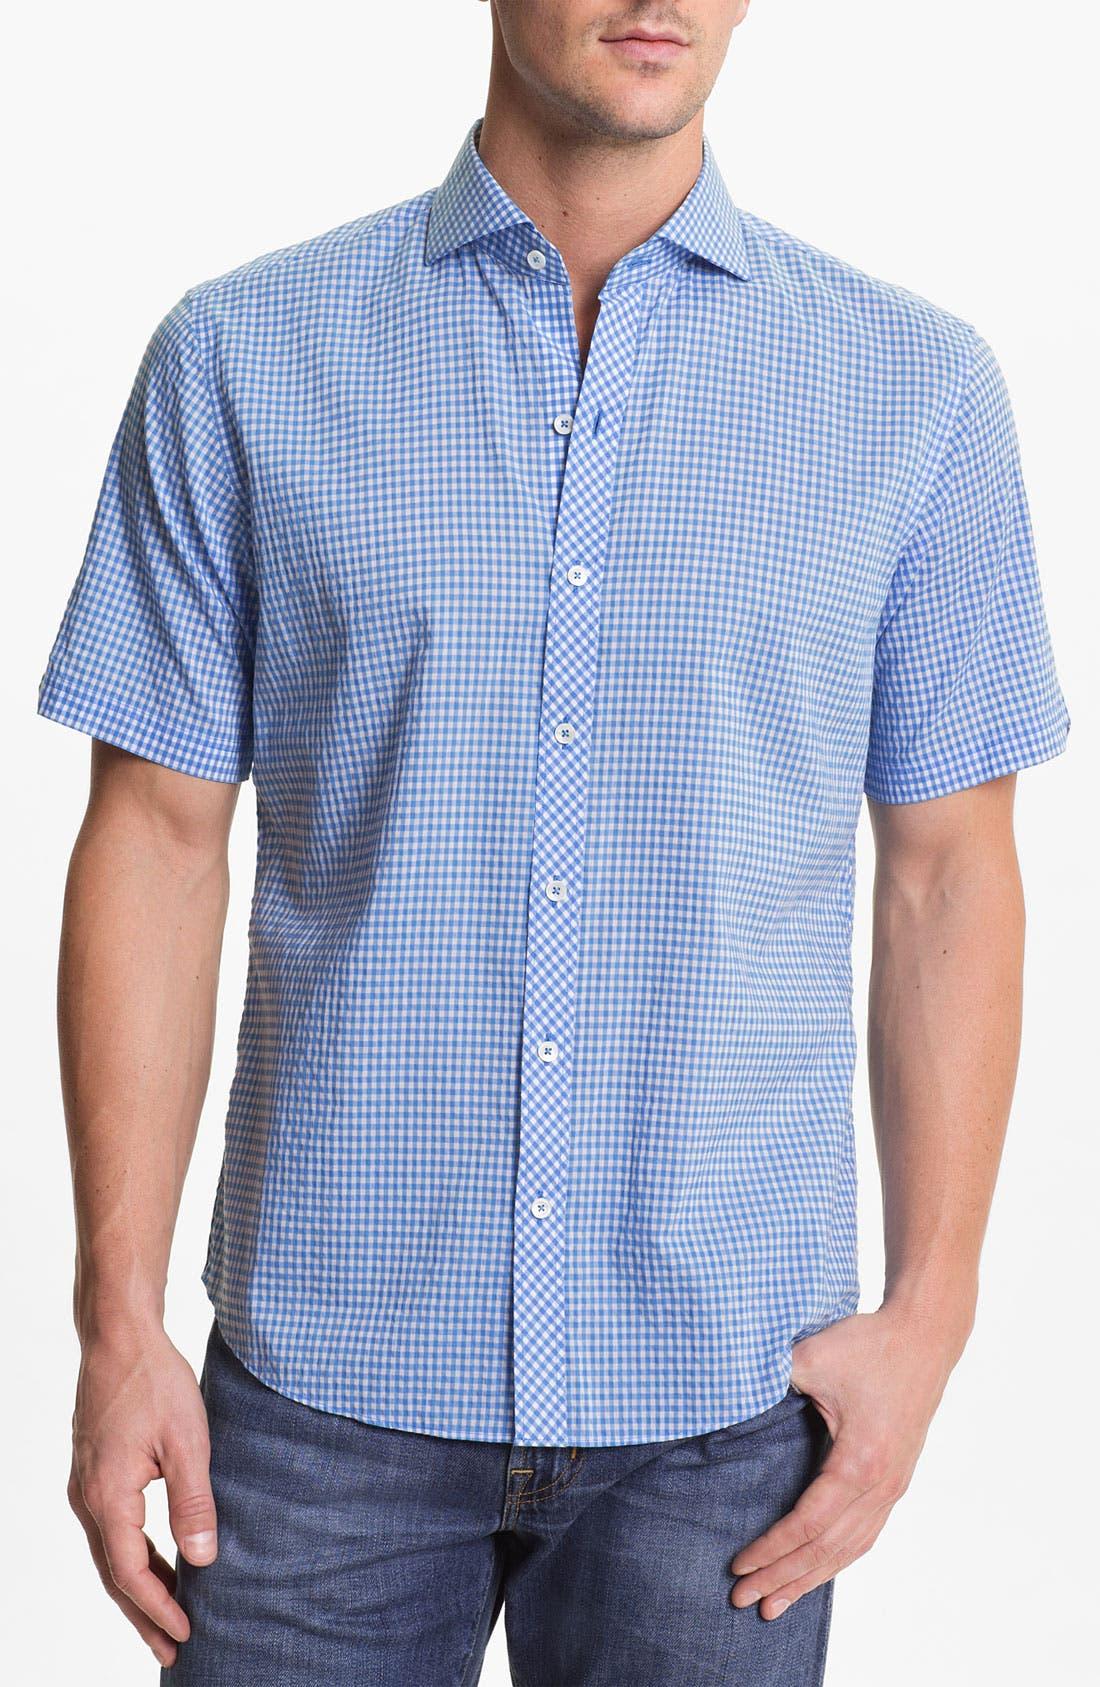 Main Image - Zachary Prell 'Davenport' Sport Shirt